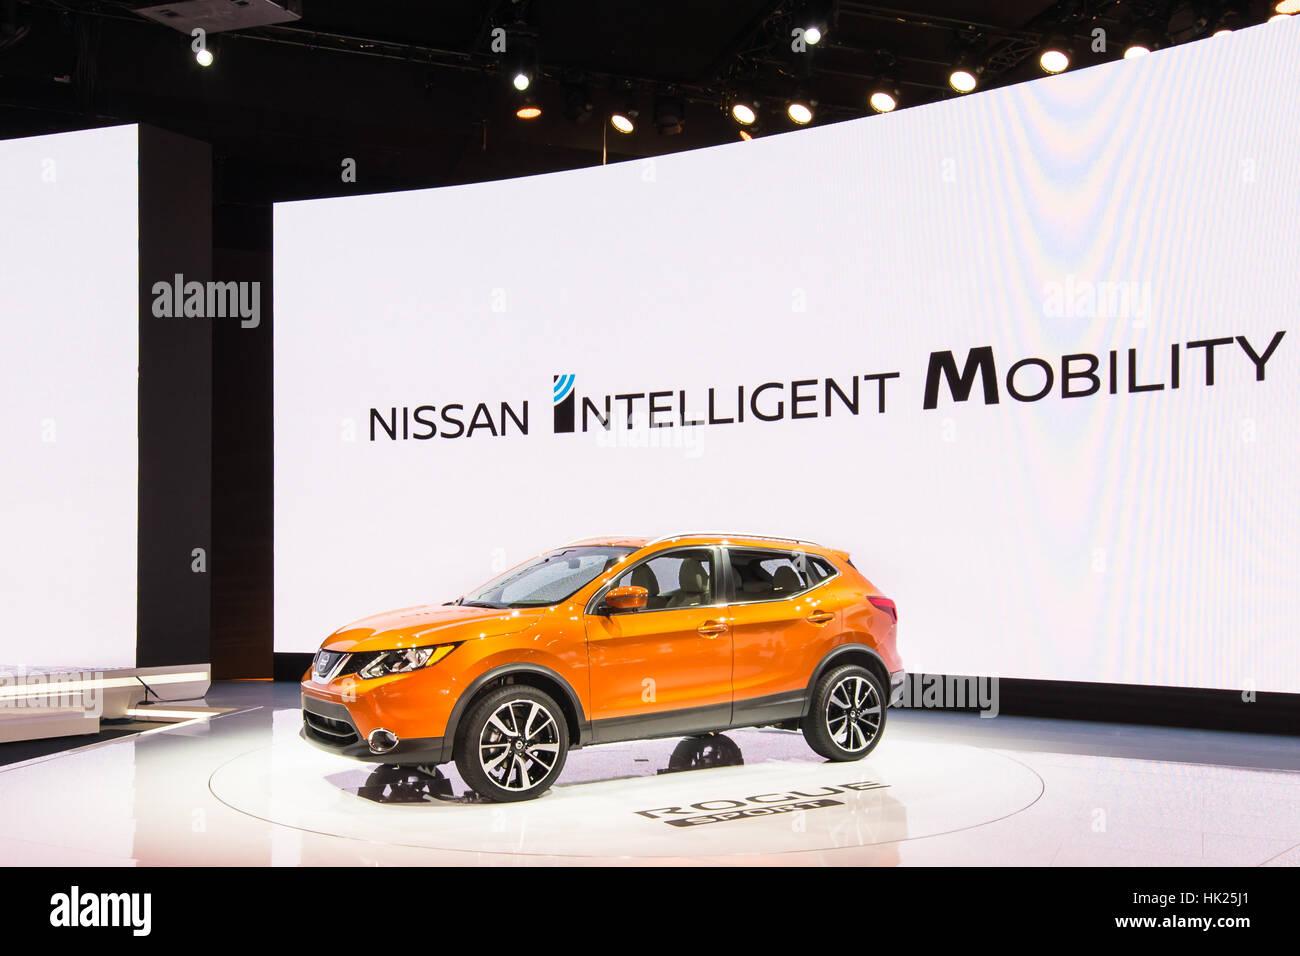 2017 Nissan Rogue Sport (Qashqai) SUV at the North American International Auto Show (NAIAS). - Stock Image